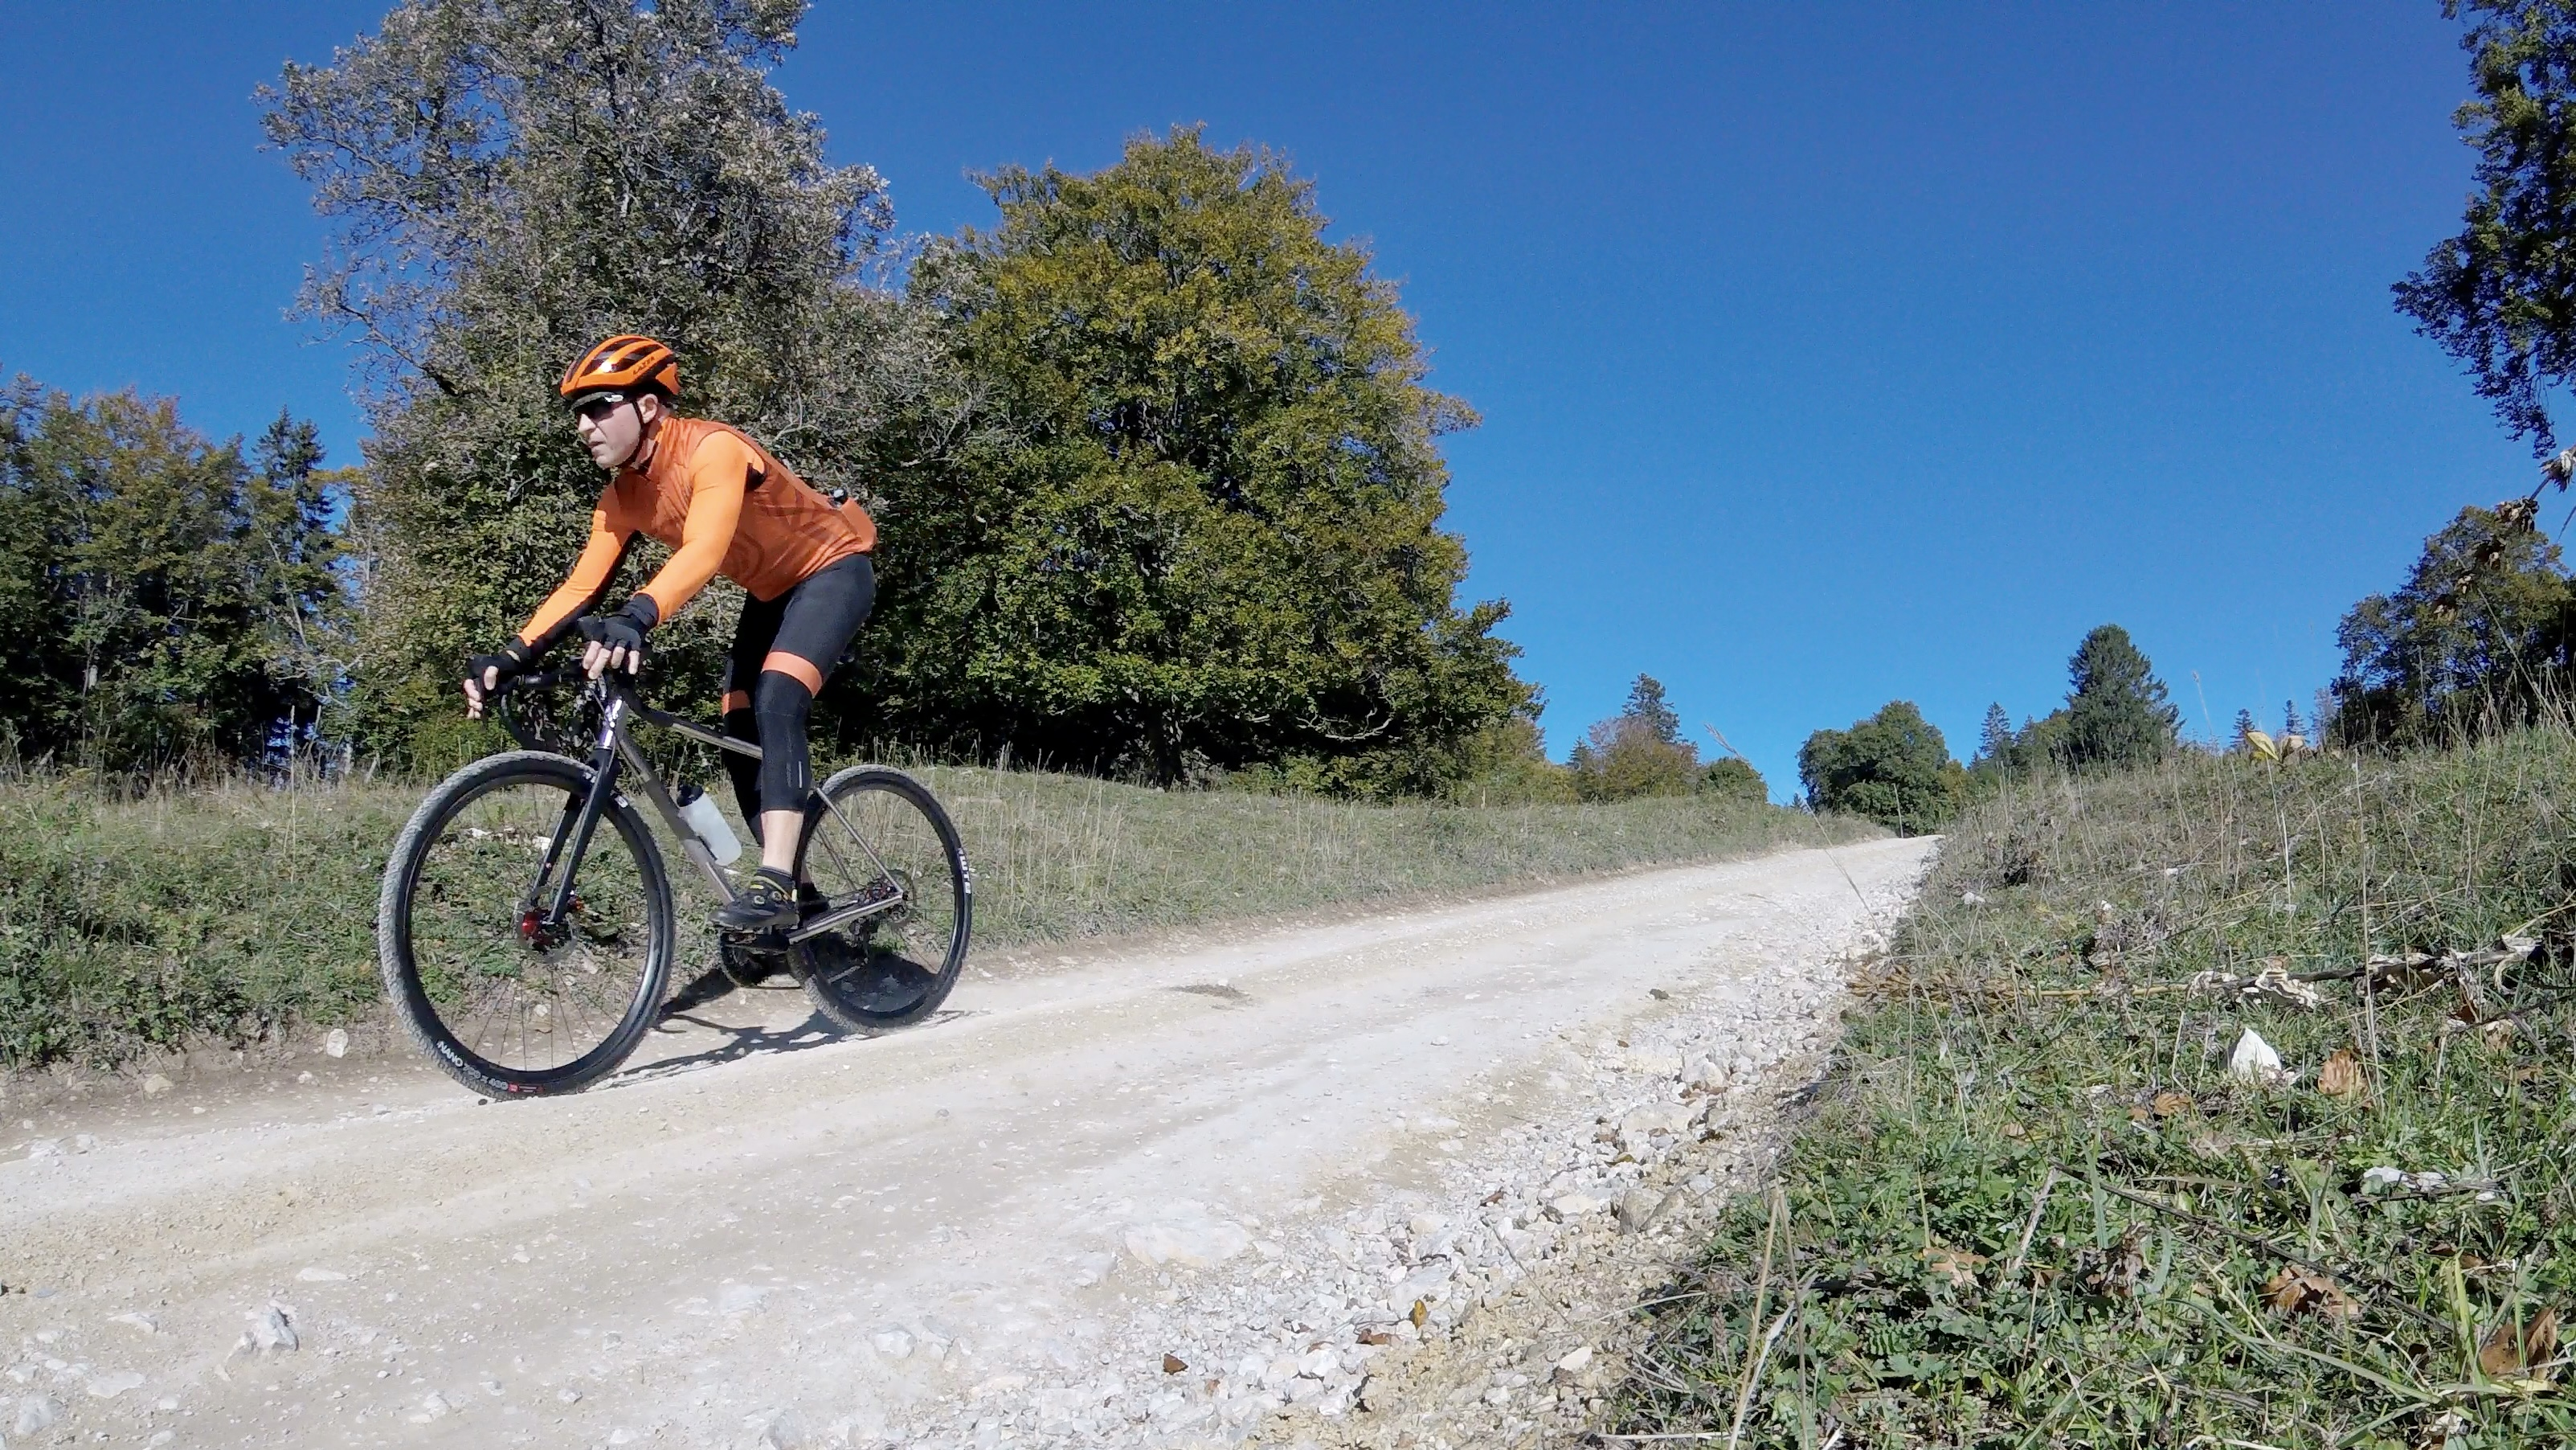 Gravel road to Plagne, Switzerland.